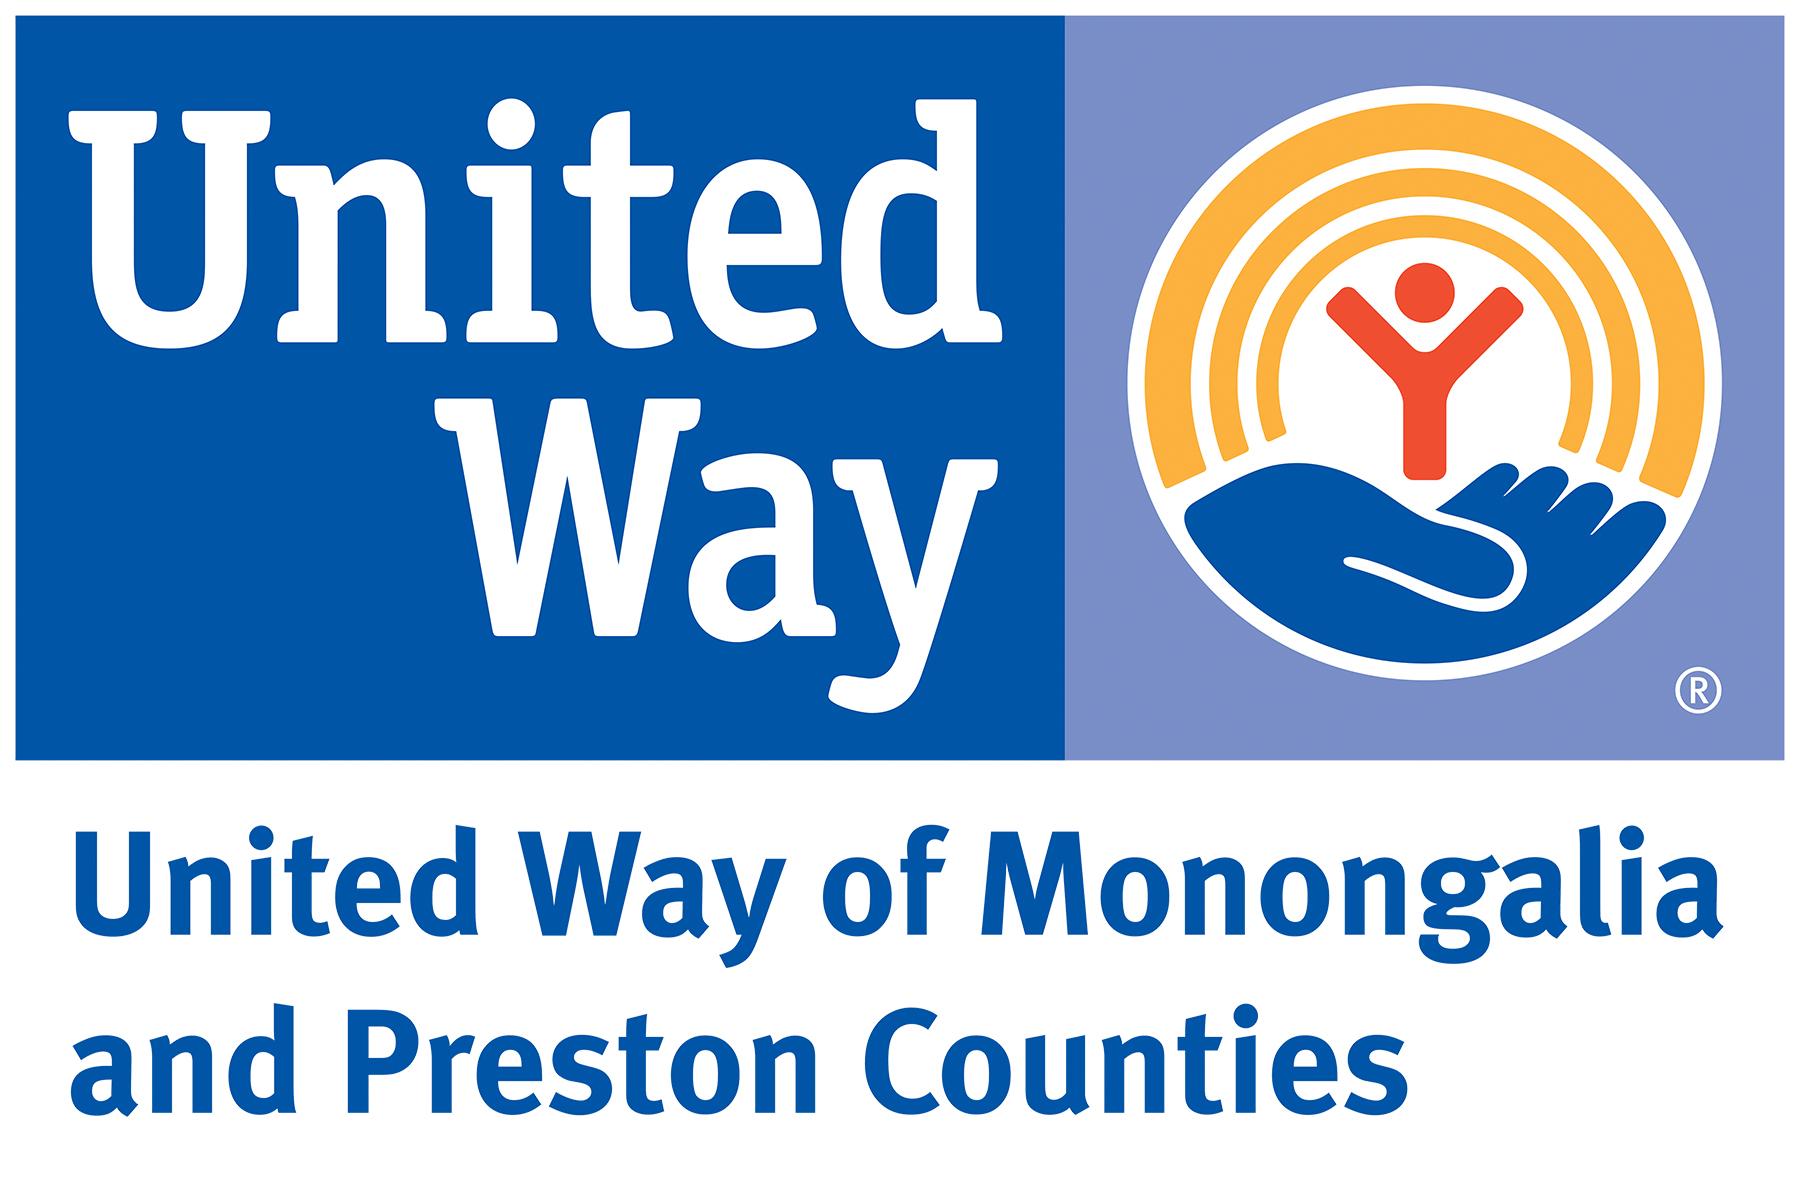 united way of monongalia and preston counties logo